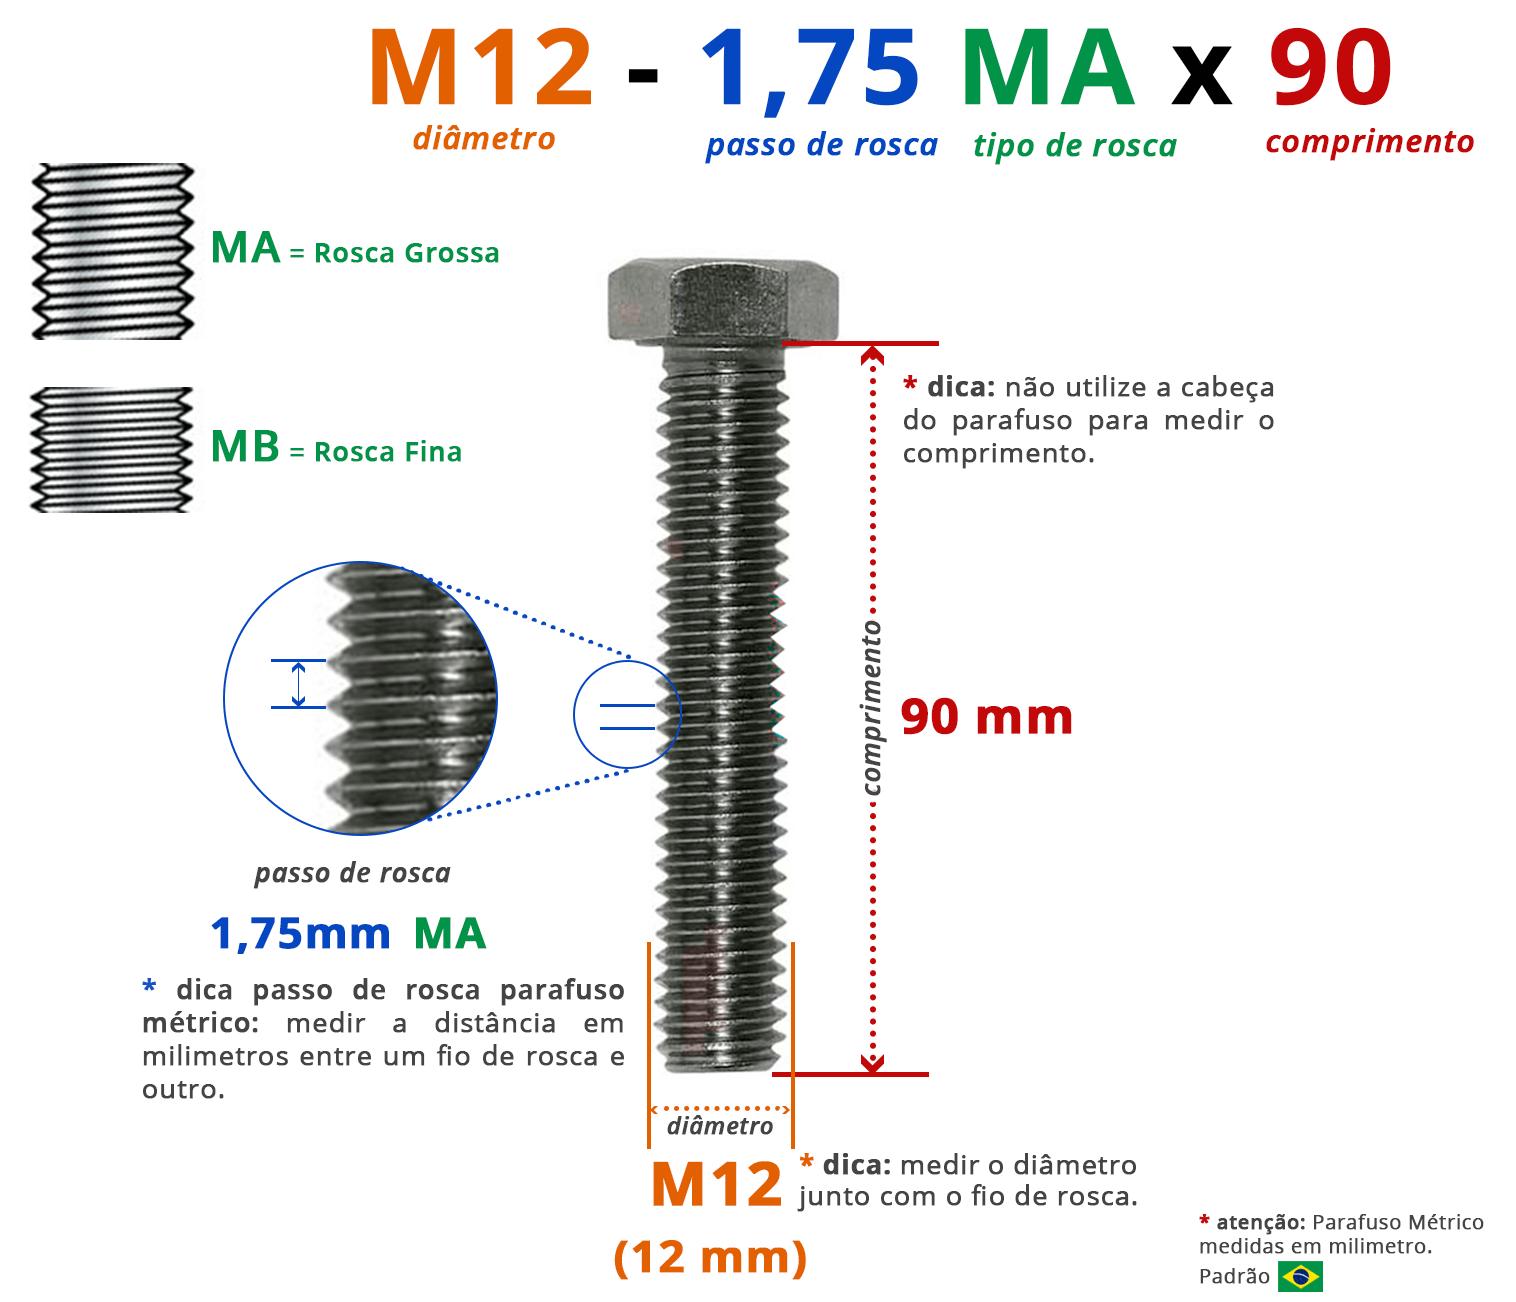 PARAFUSO SEXTAVADO ROSCA INTEIRA M12 1,75 MA X 90 DIN 933 INOX A4